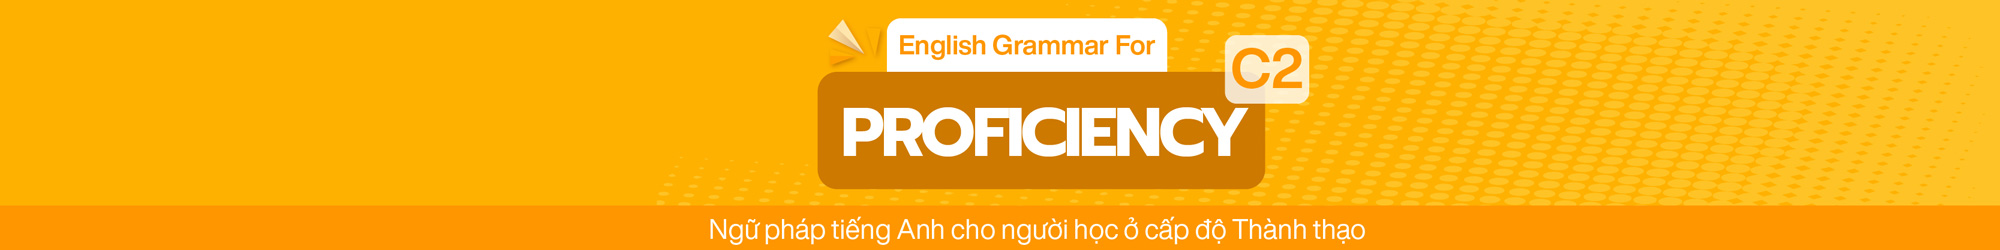 English Grammar For Proficiency (C2) banner